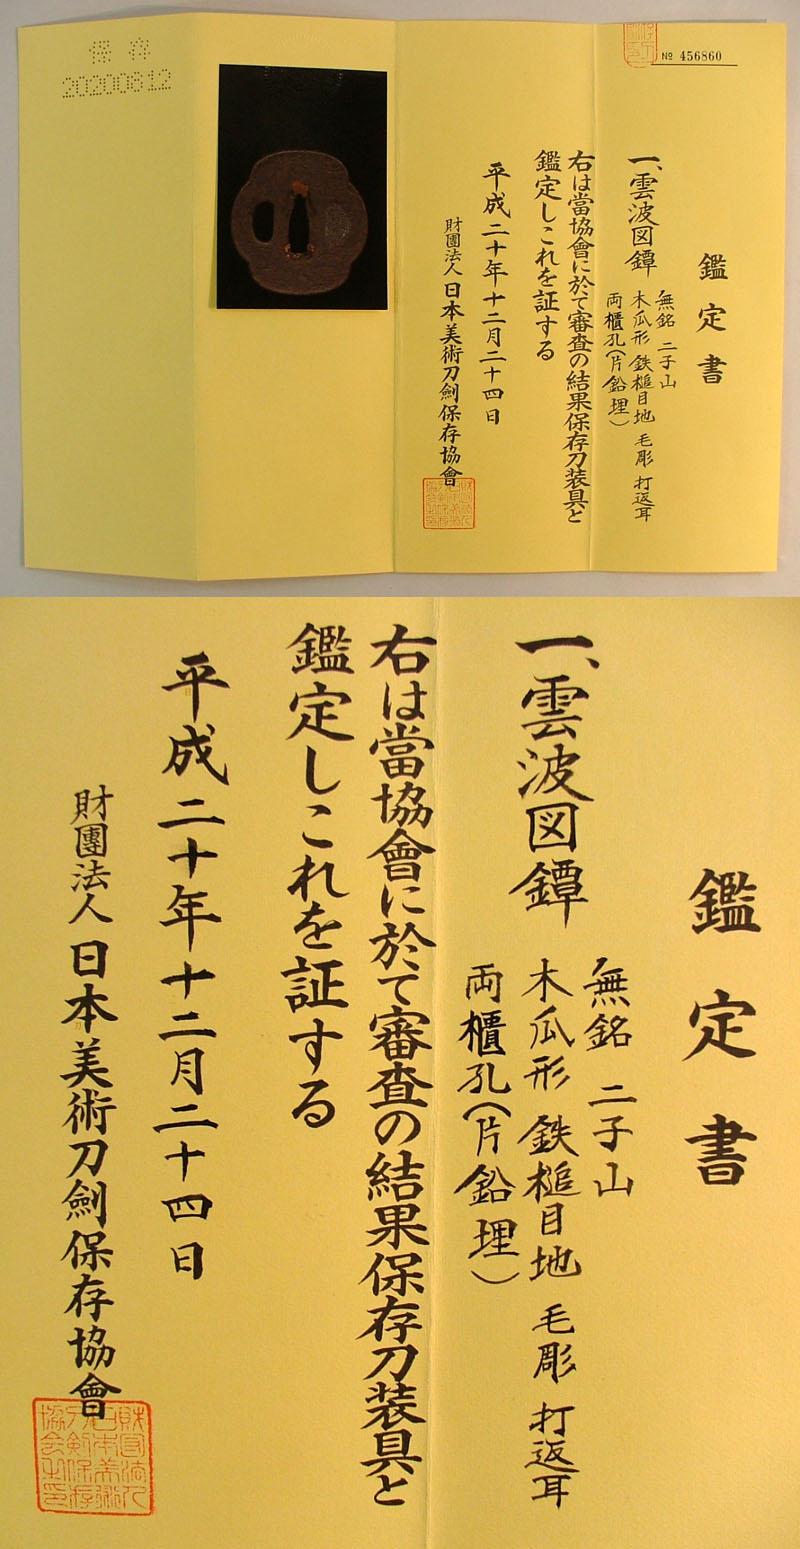 雲波図鐔 無銘 2子山 Picture of Certificate